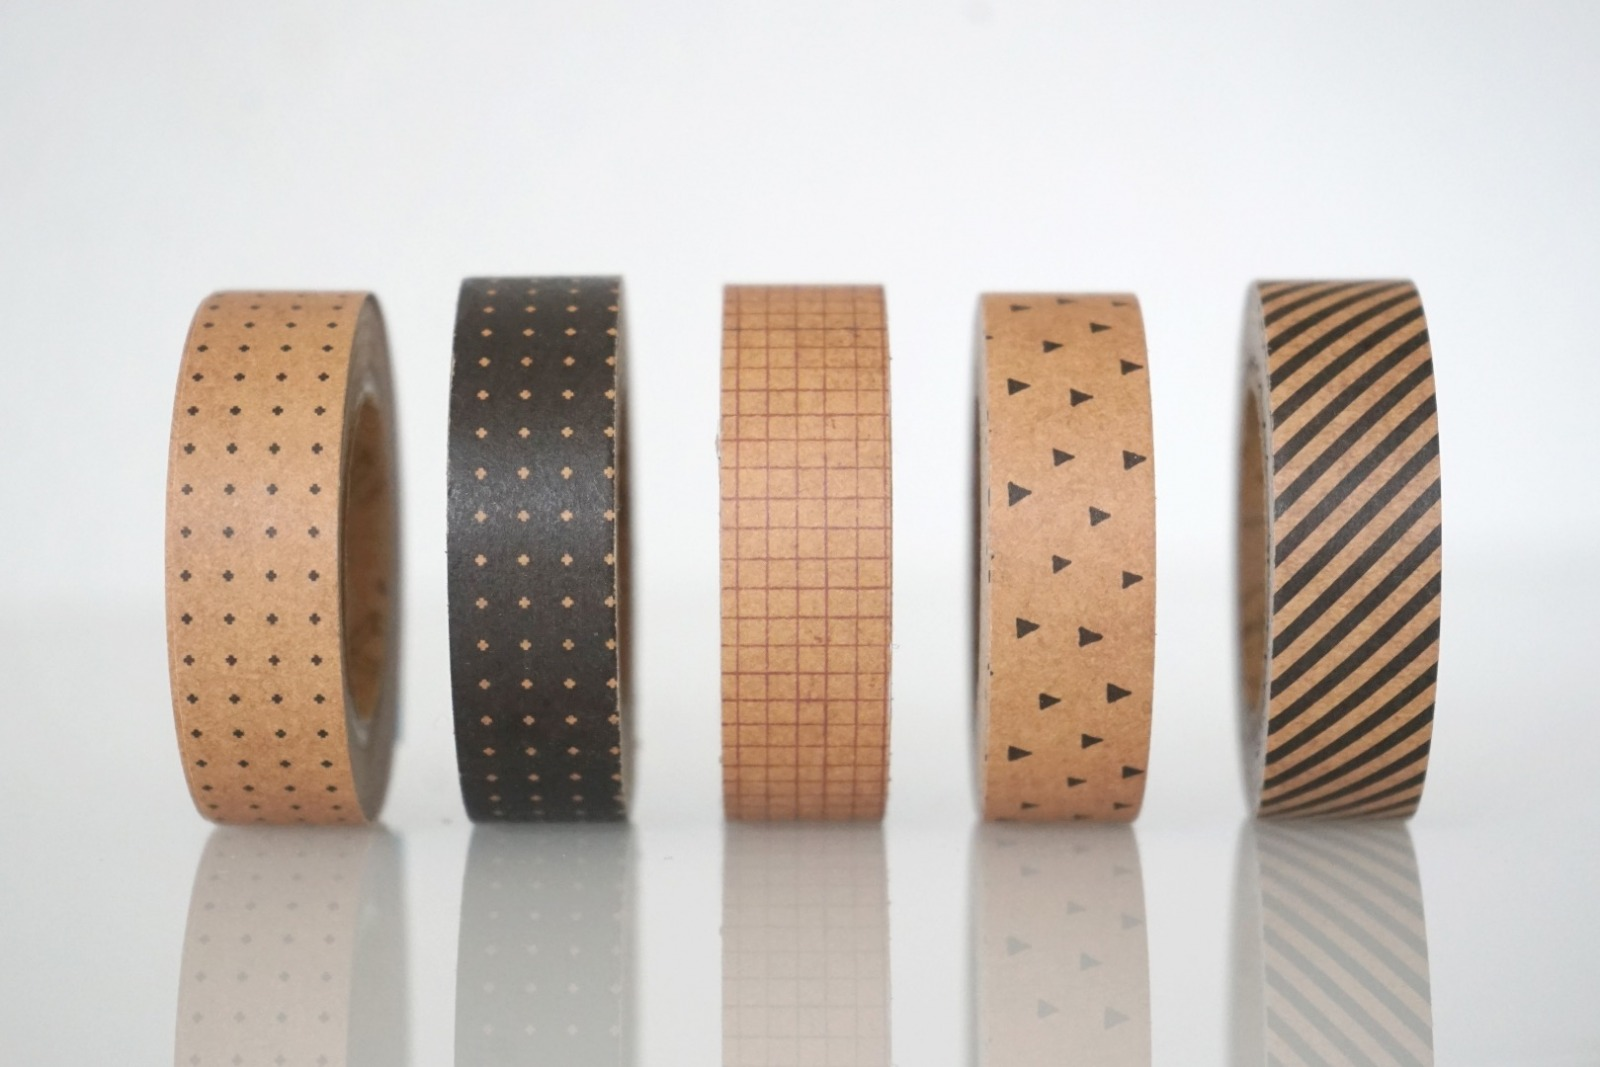 Klebeband Kraftpapier geometrische Muster - 2